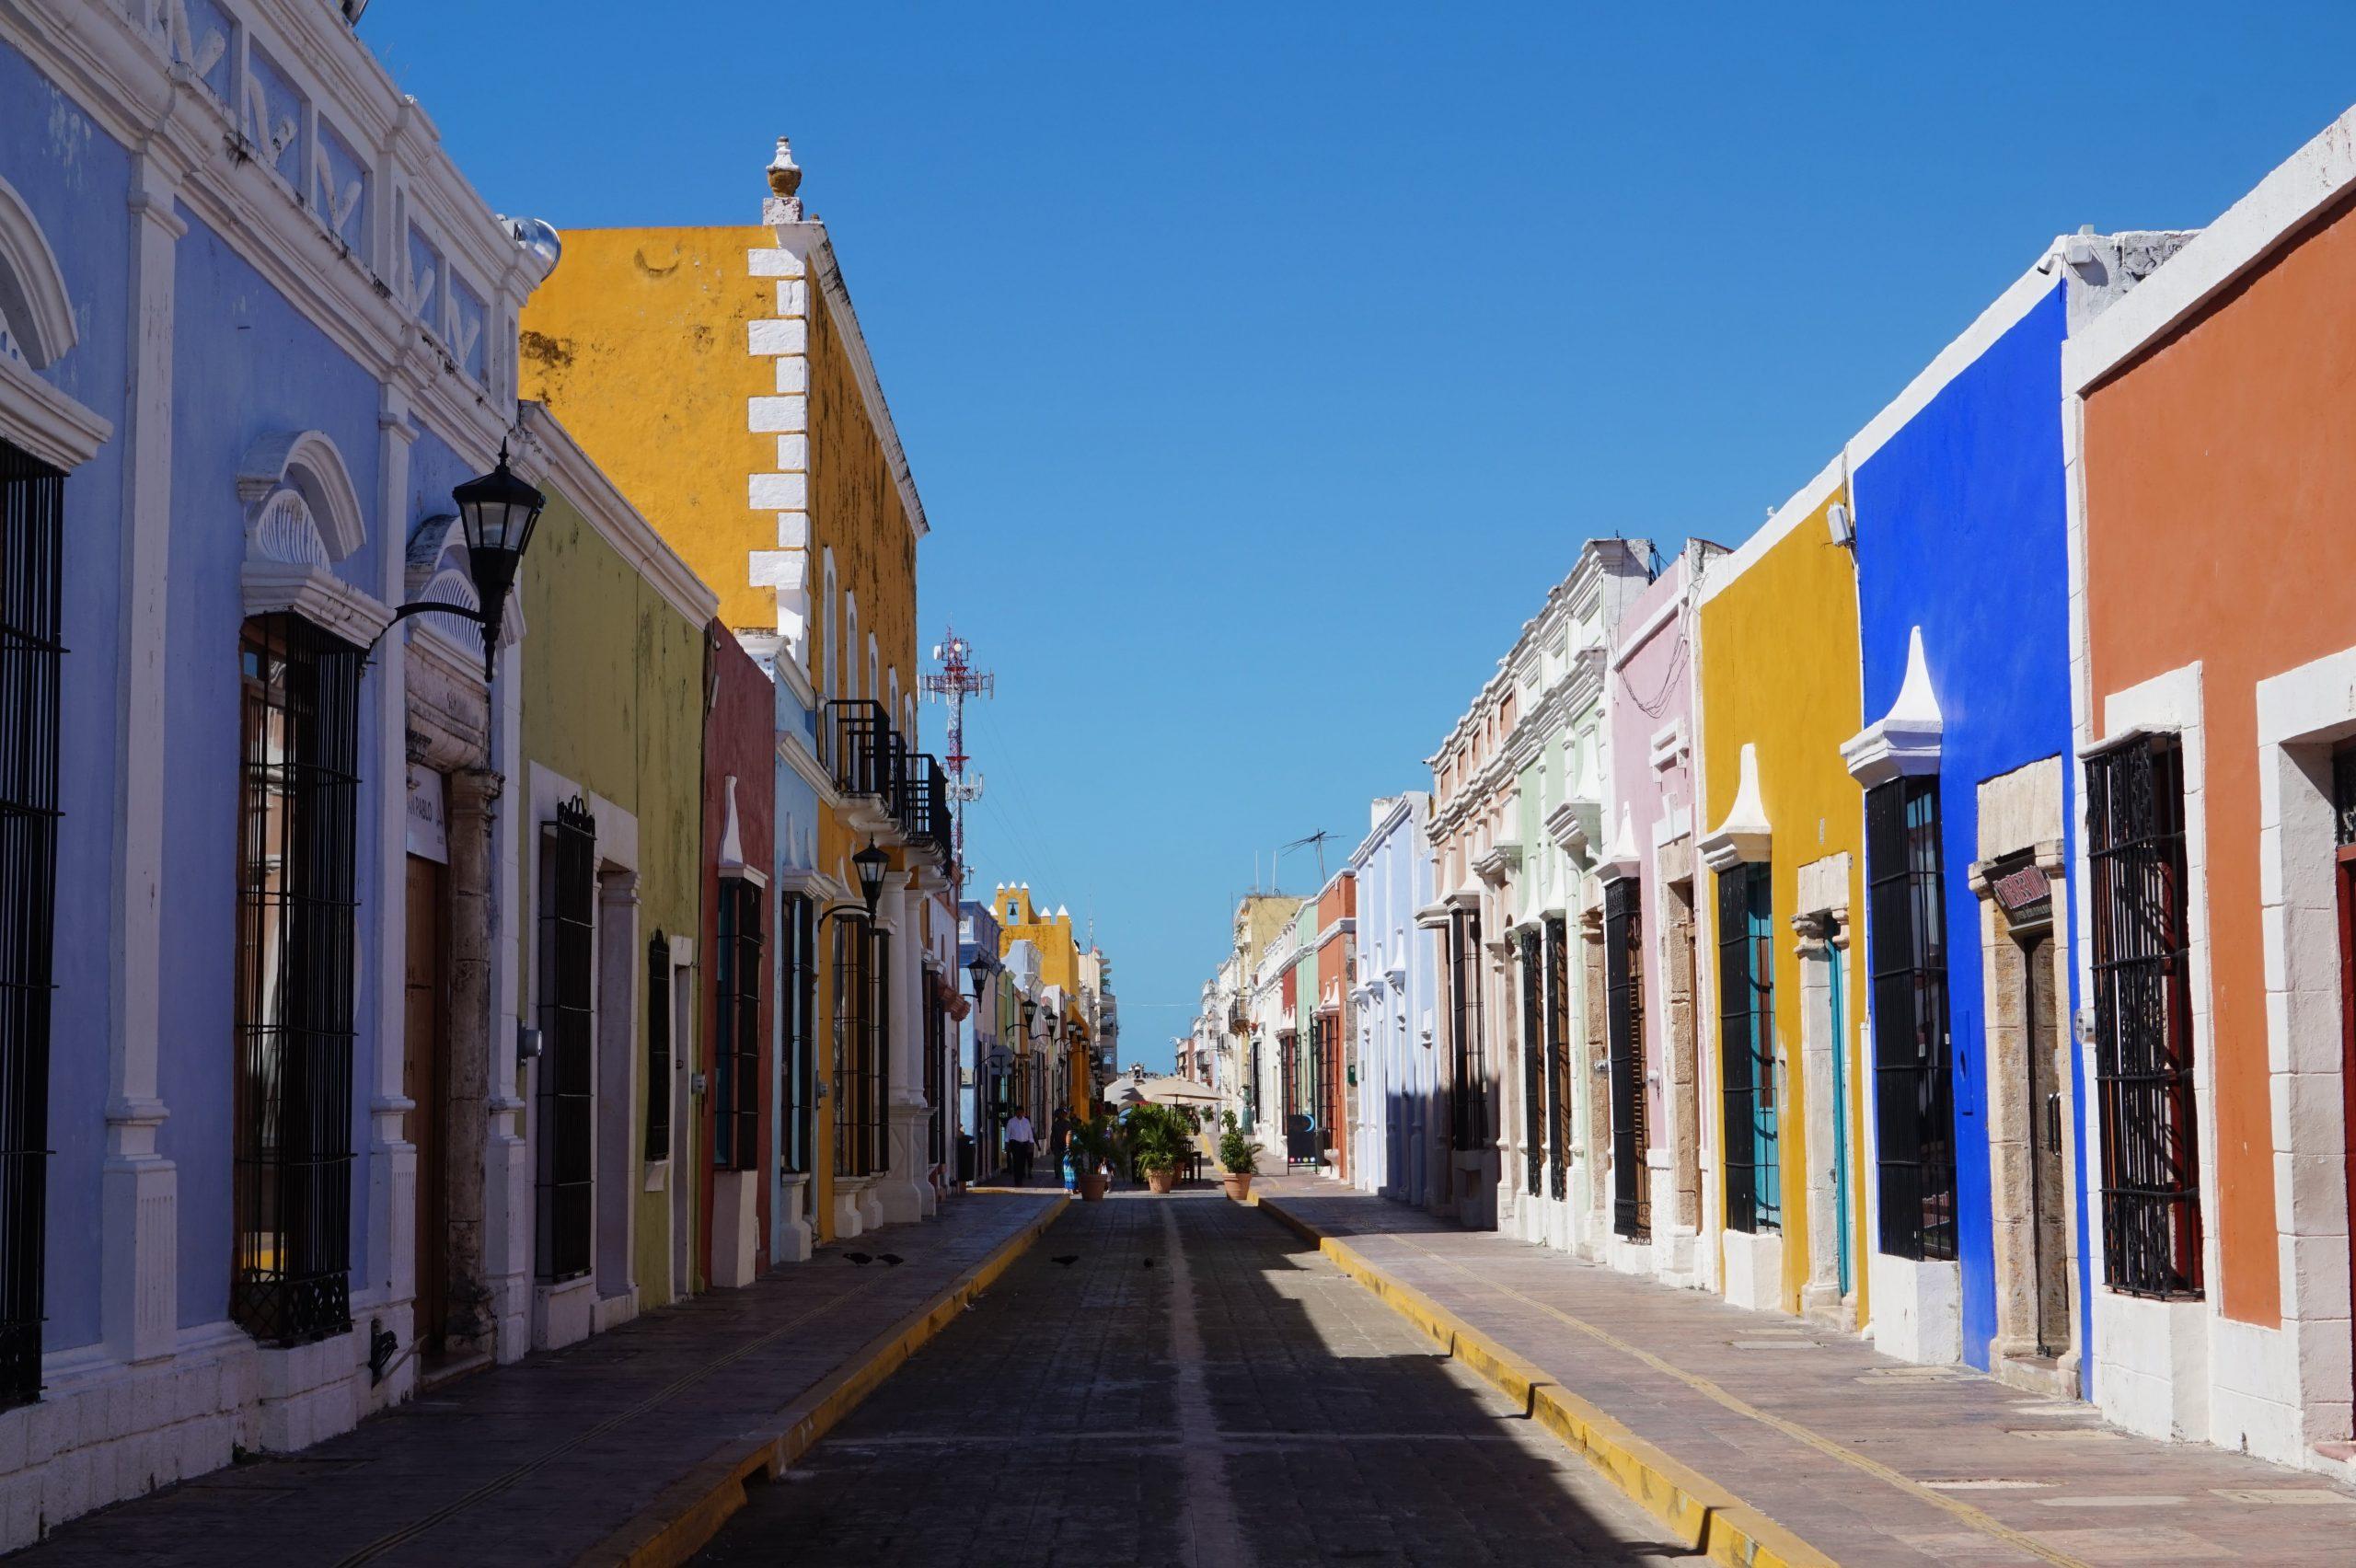 Kolonialne miasta campeche